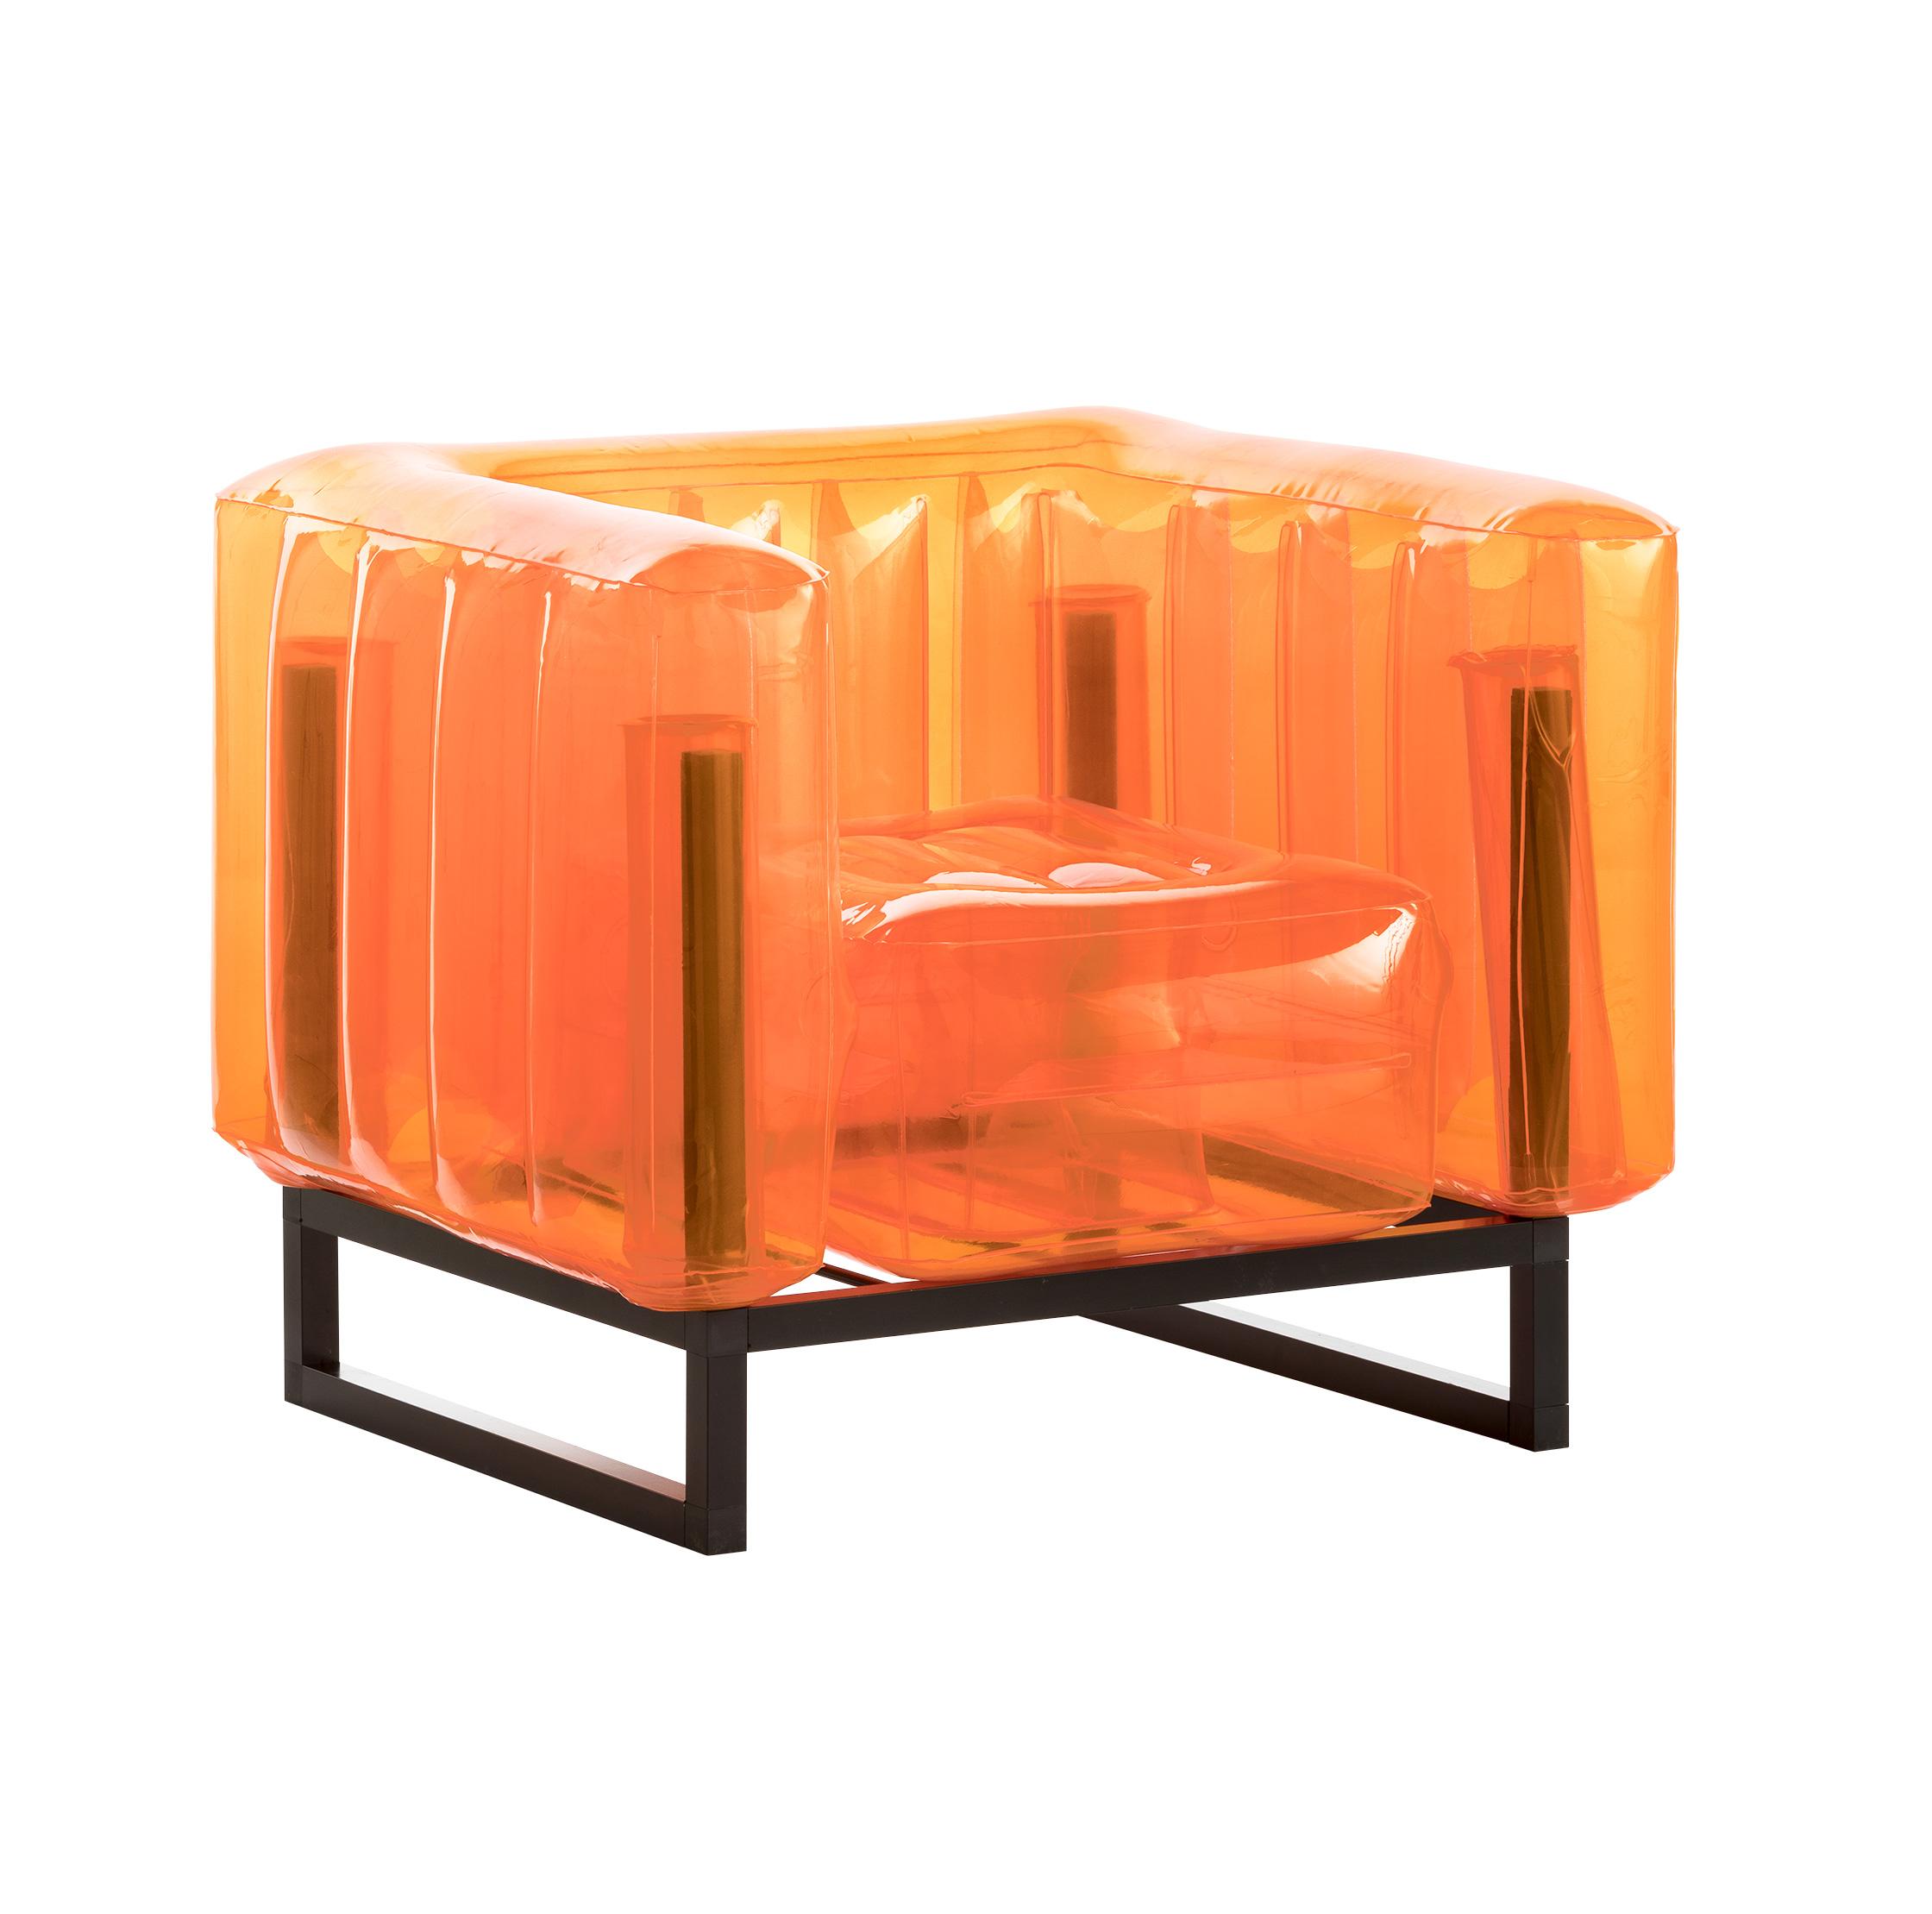 Fauteuil cadre aluminium noir assise tpu orange